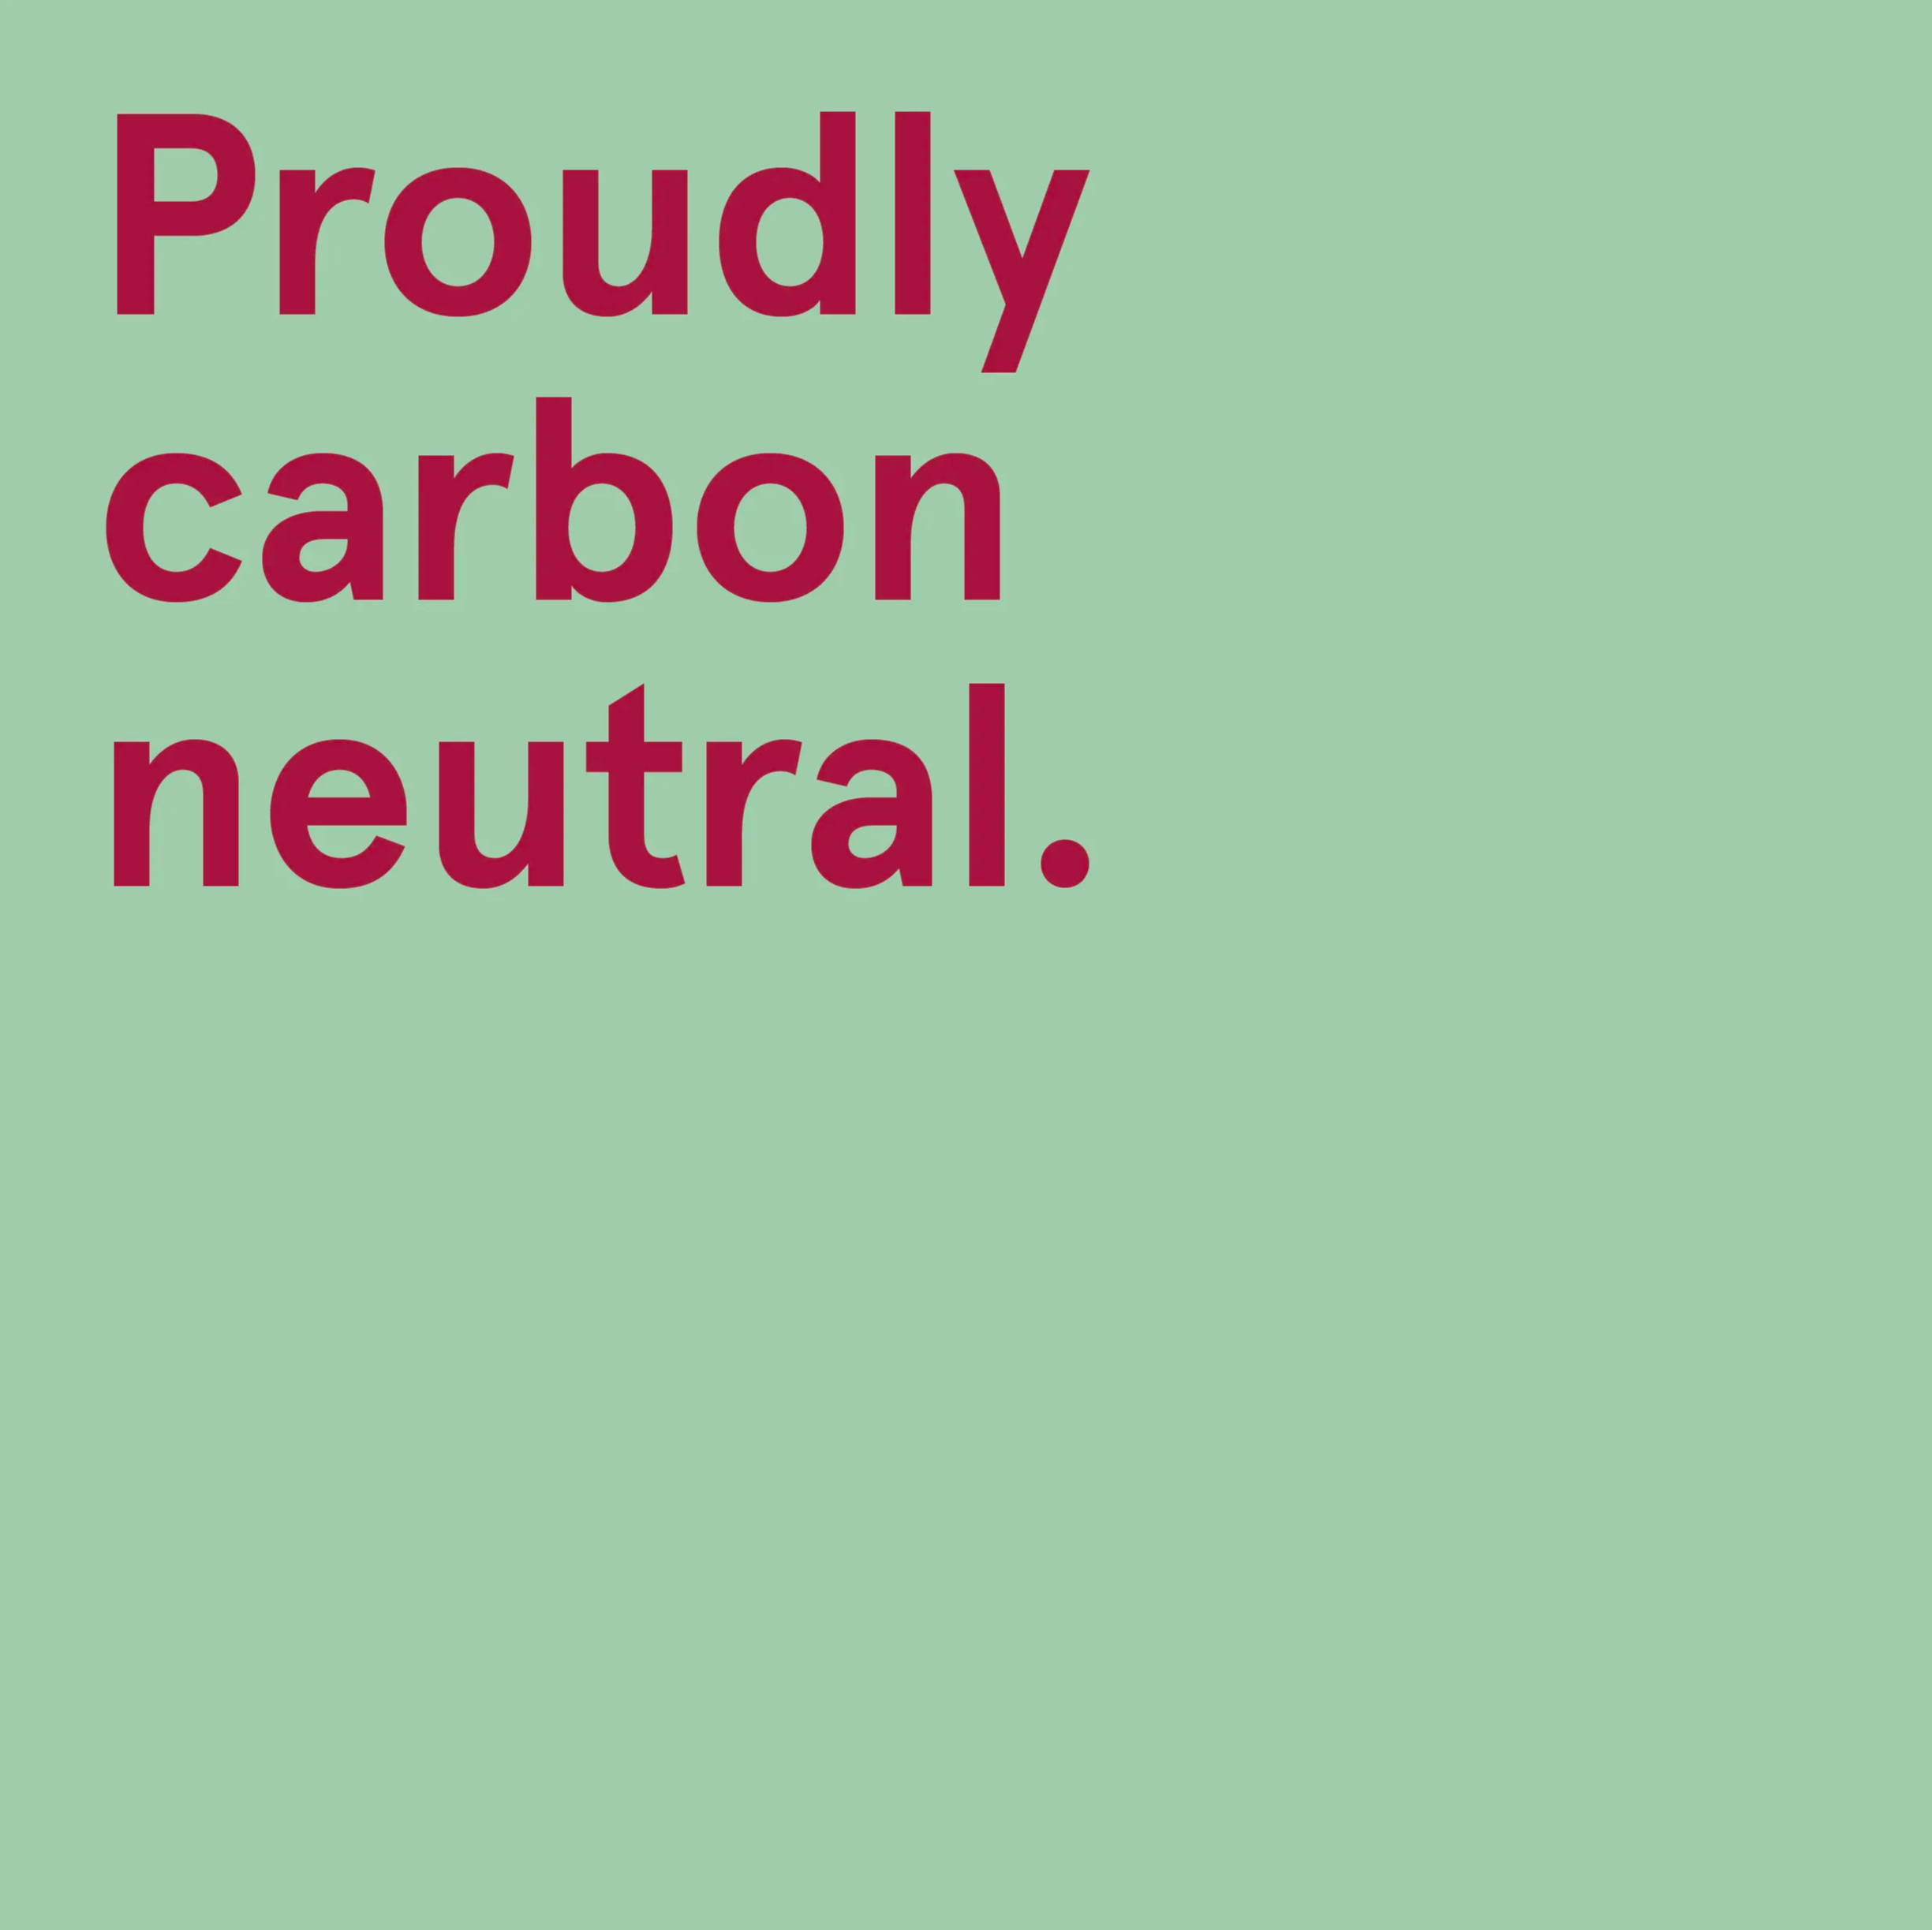 Proudly carbon neutral.